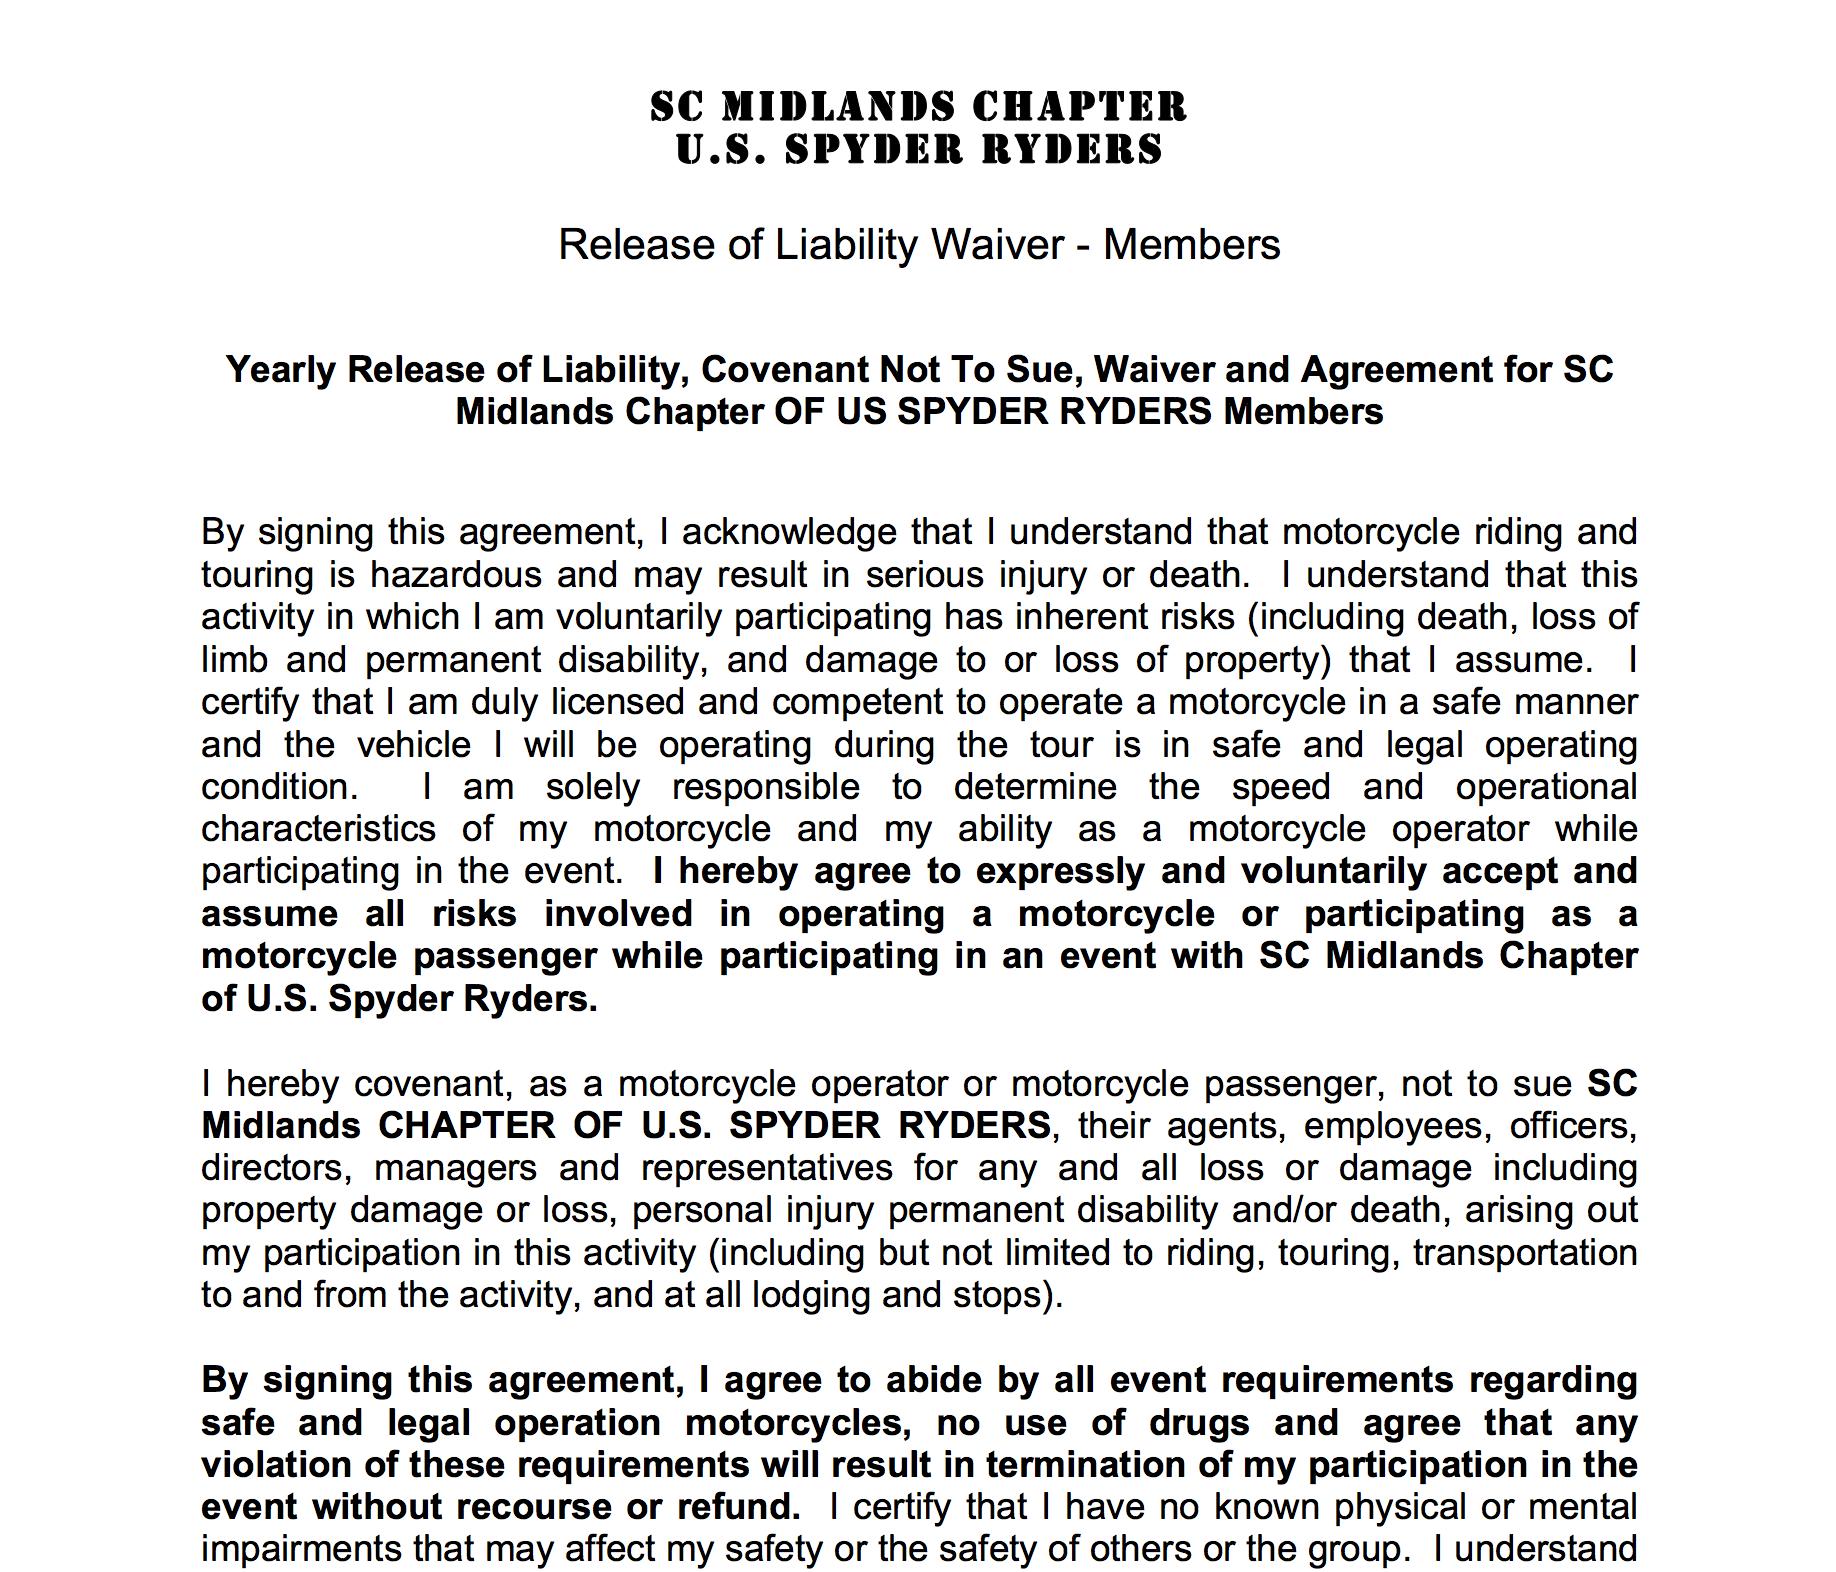 South Carolina Midlands Chapter Liability Waiver - Member